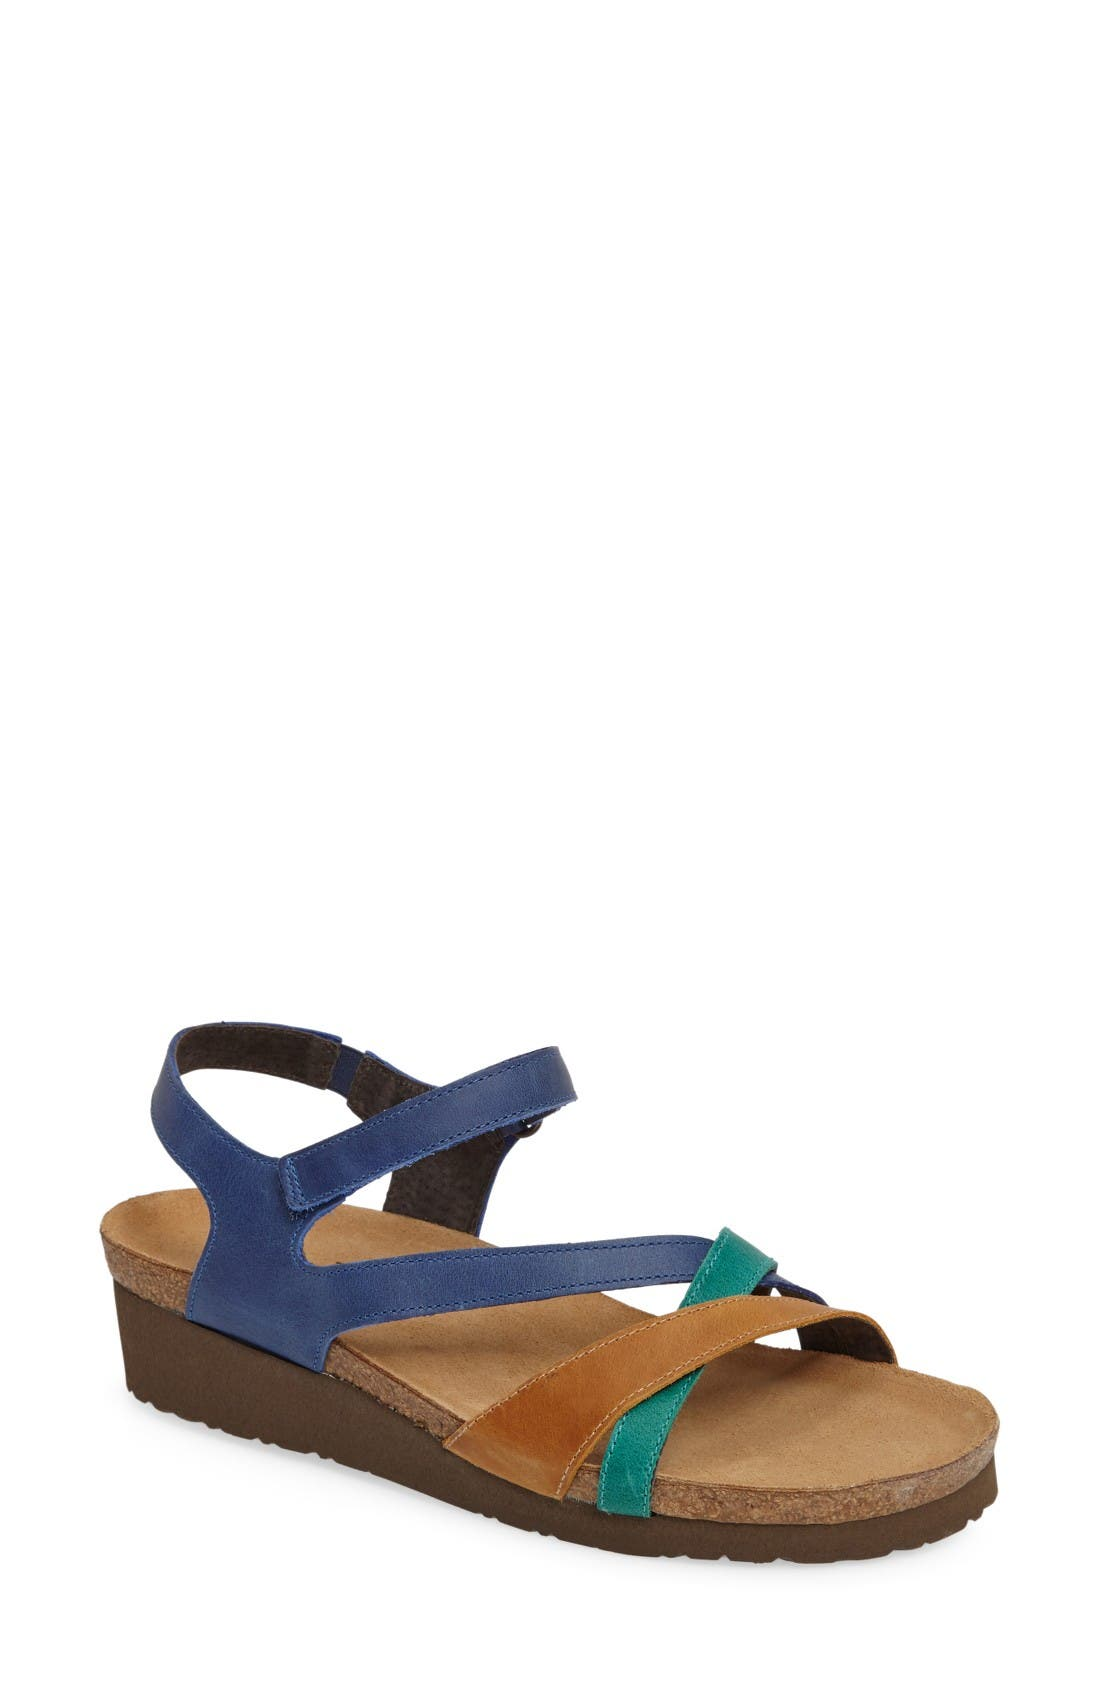 'Sophia' Sandal,                             Main thumbnail 1, color,                             Blue/ Brown Nubuck Leather